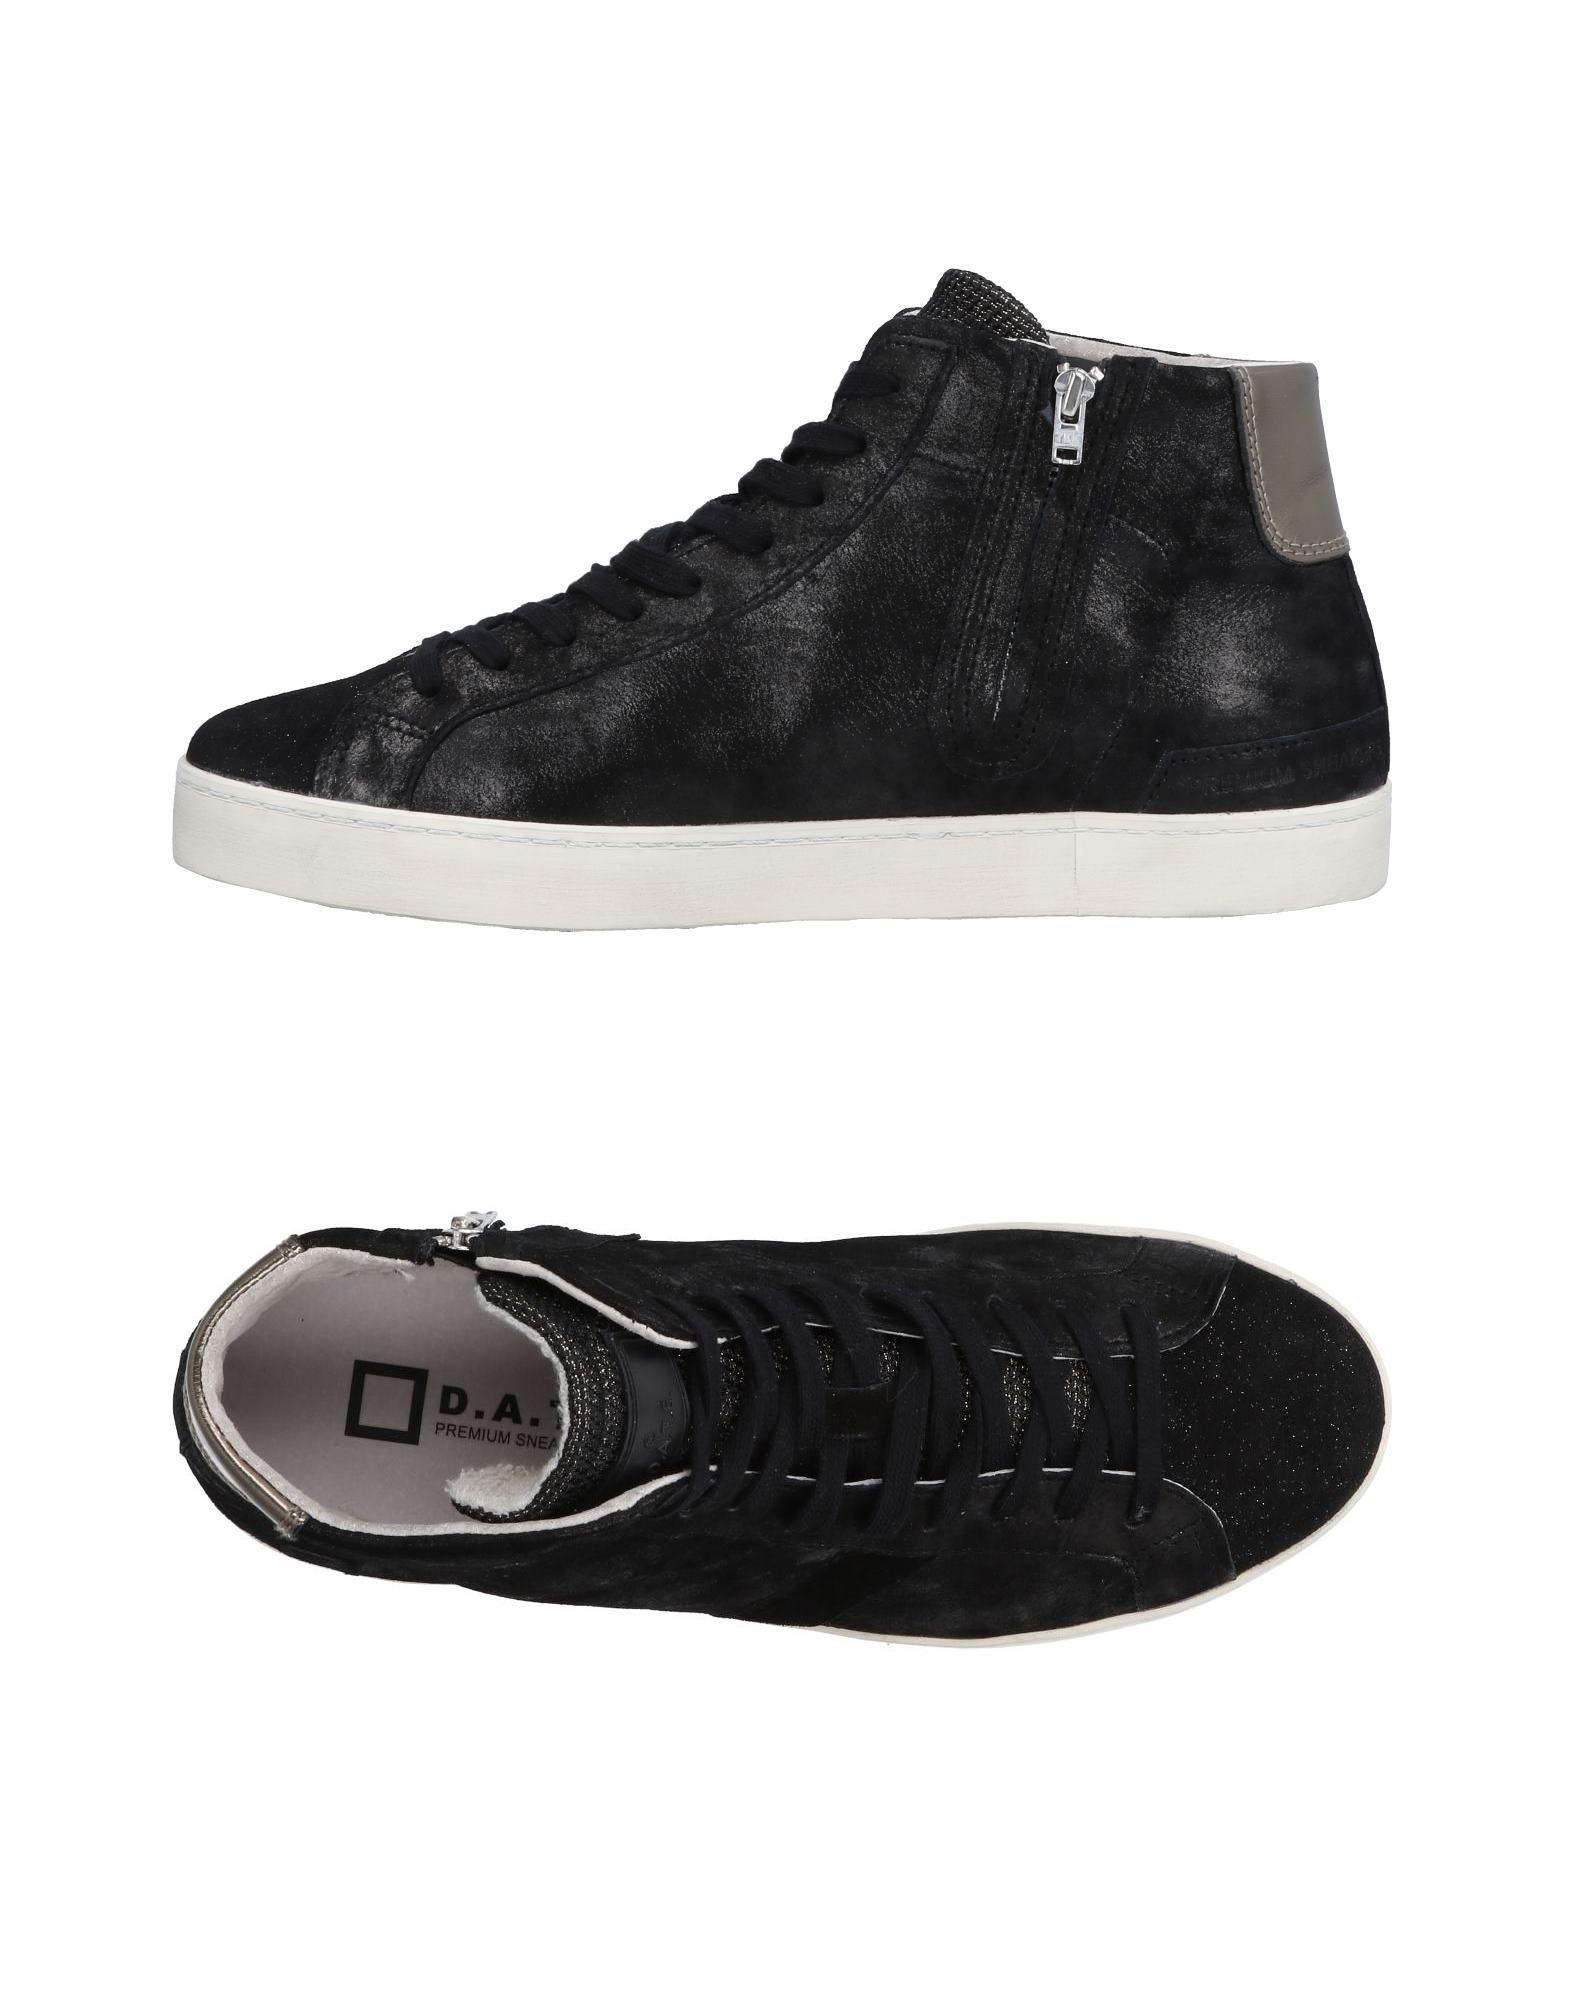 Moda Sneakers Sneakers Moda D.A.T.E. Donna - 11497979AH c5bbdb